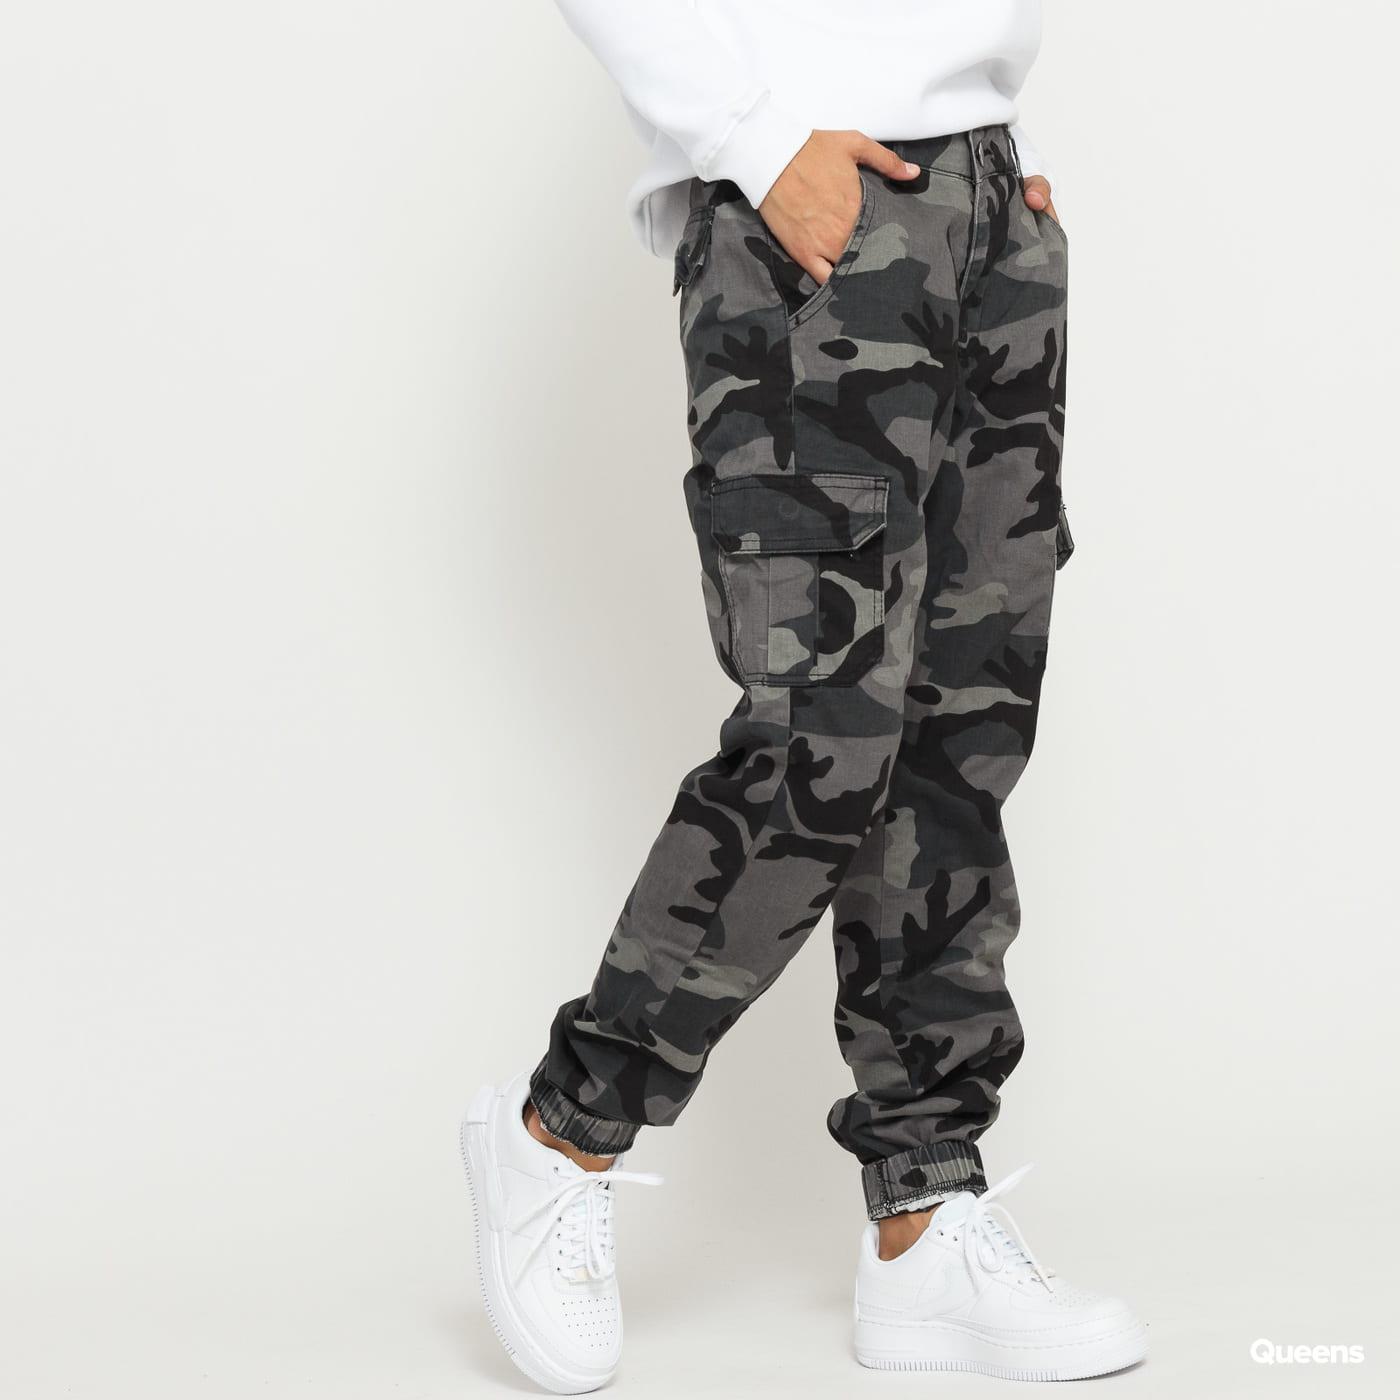 Urban Classics Ladies High Waist Camo Cargo Pants camo dark gray